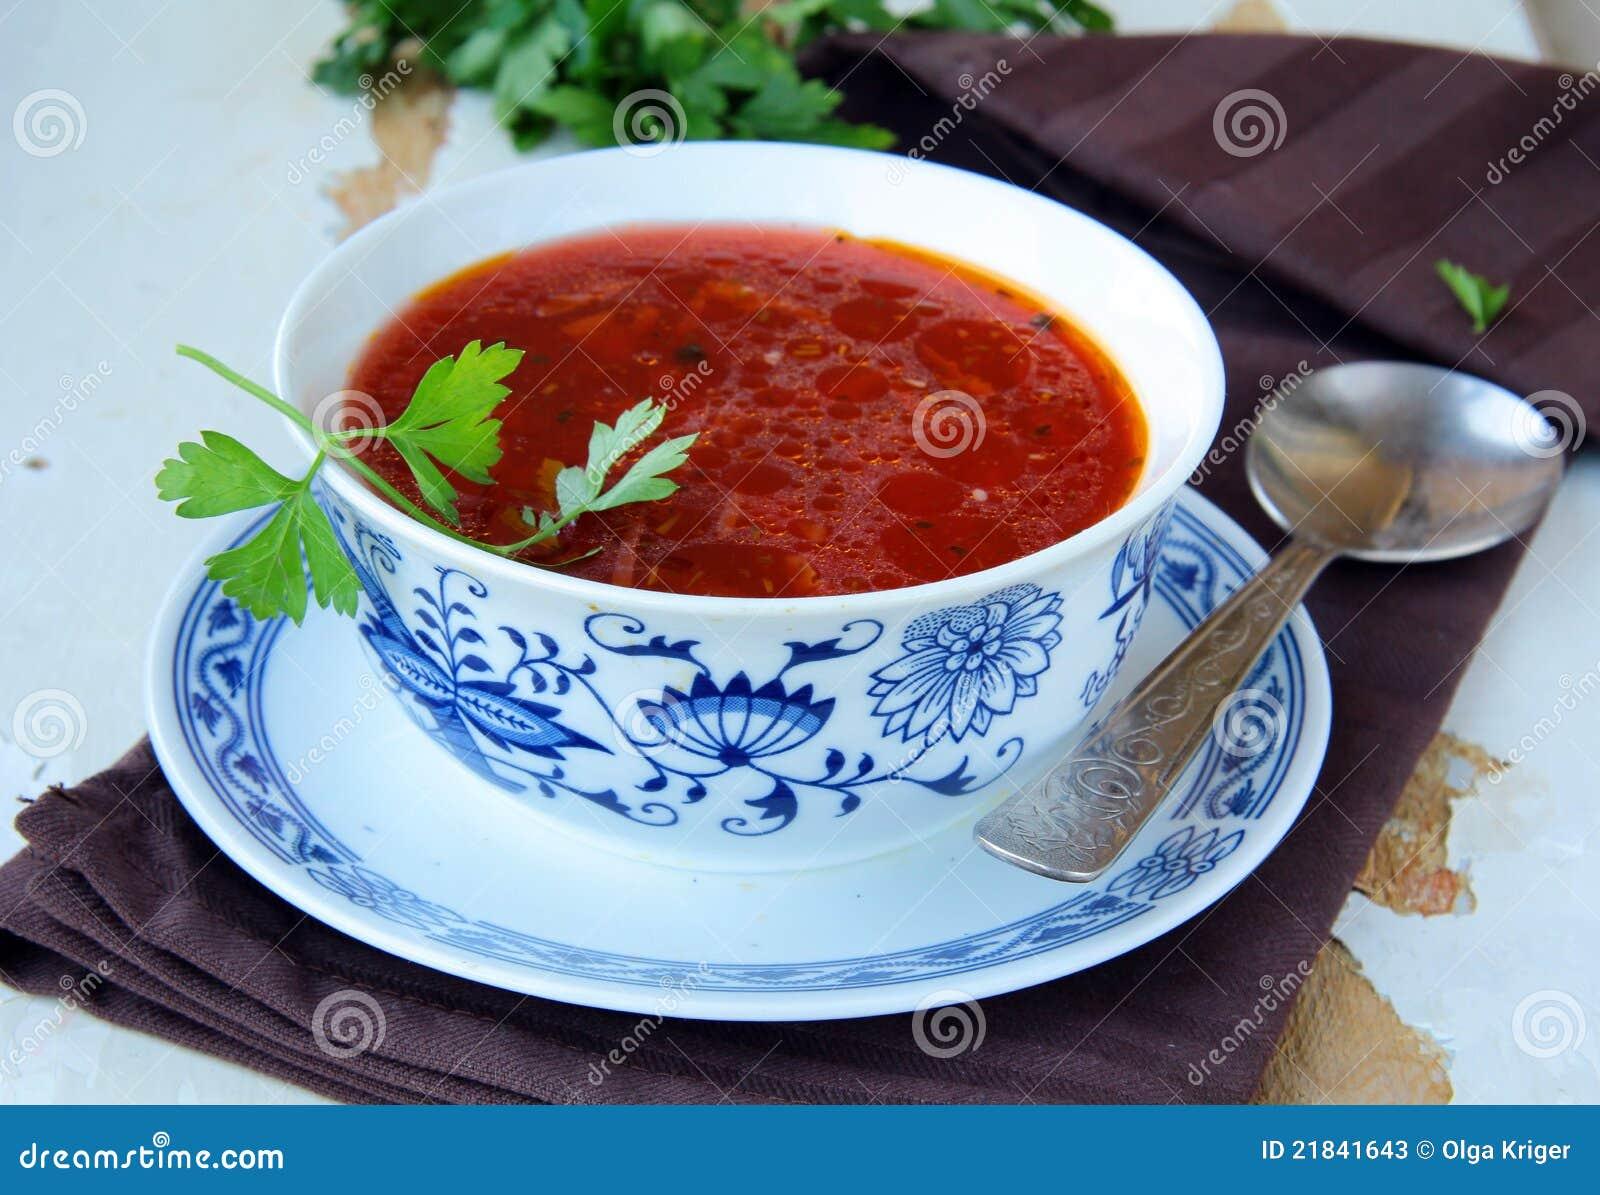 ... fagioli soup italian pasta and bean soup ukrainian red borscht soup